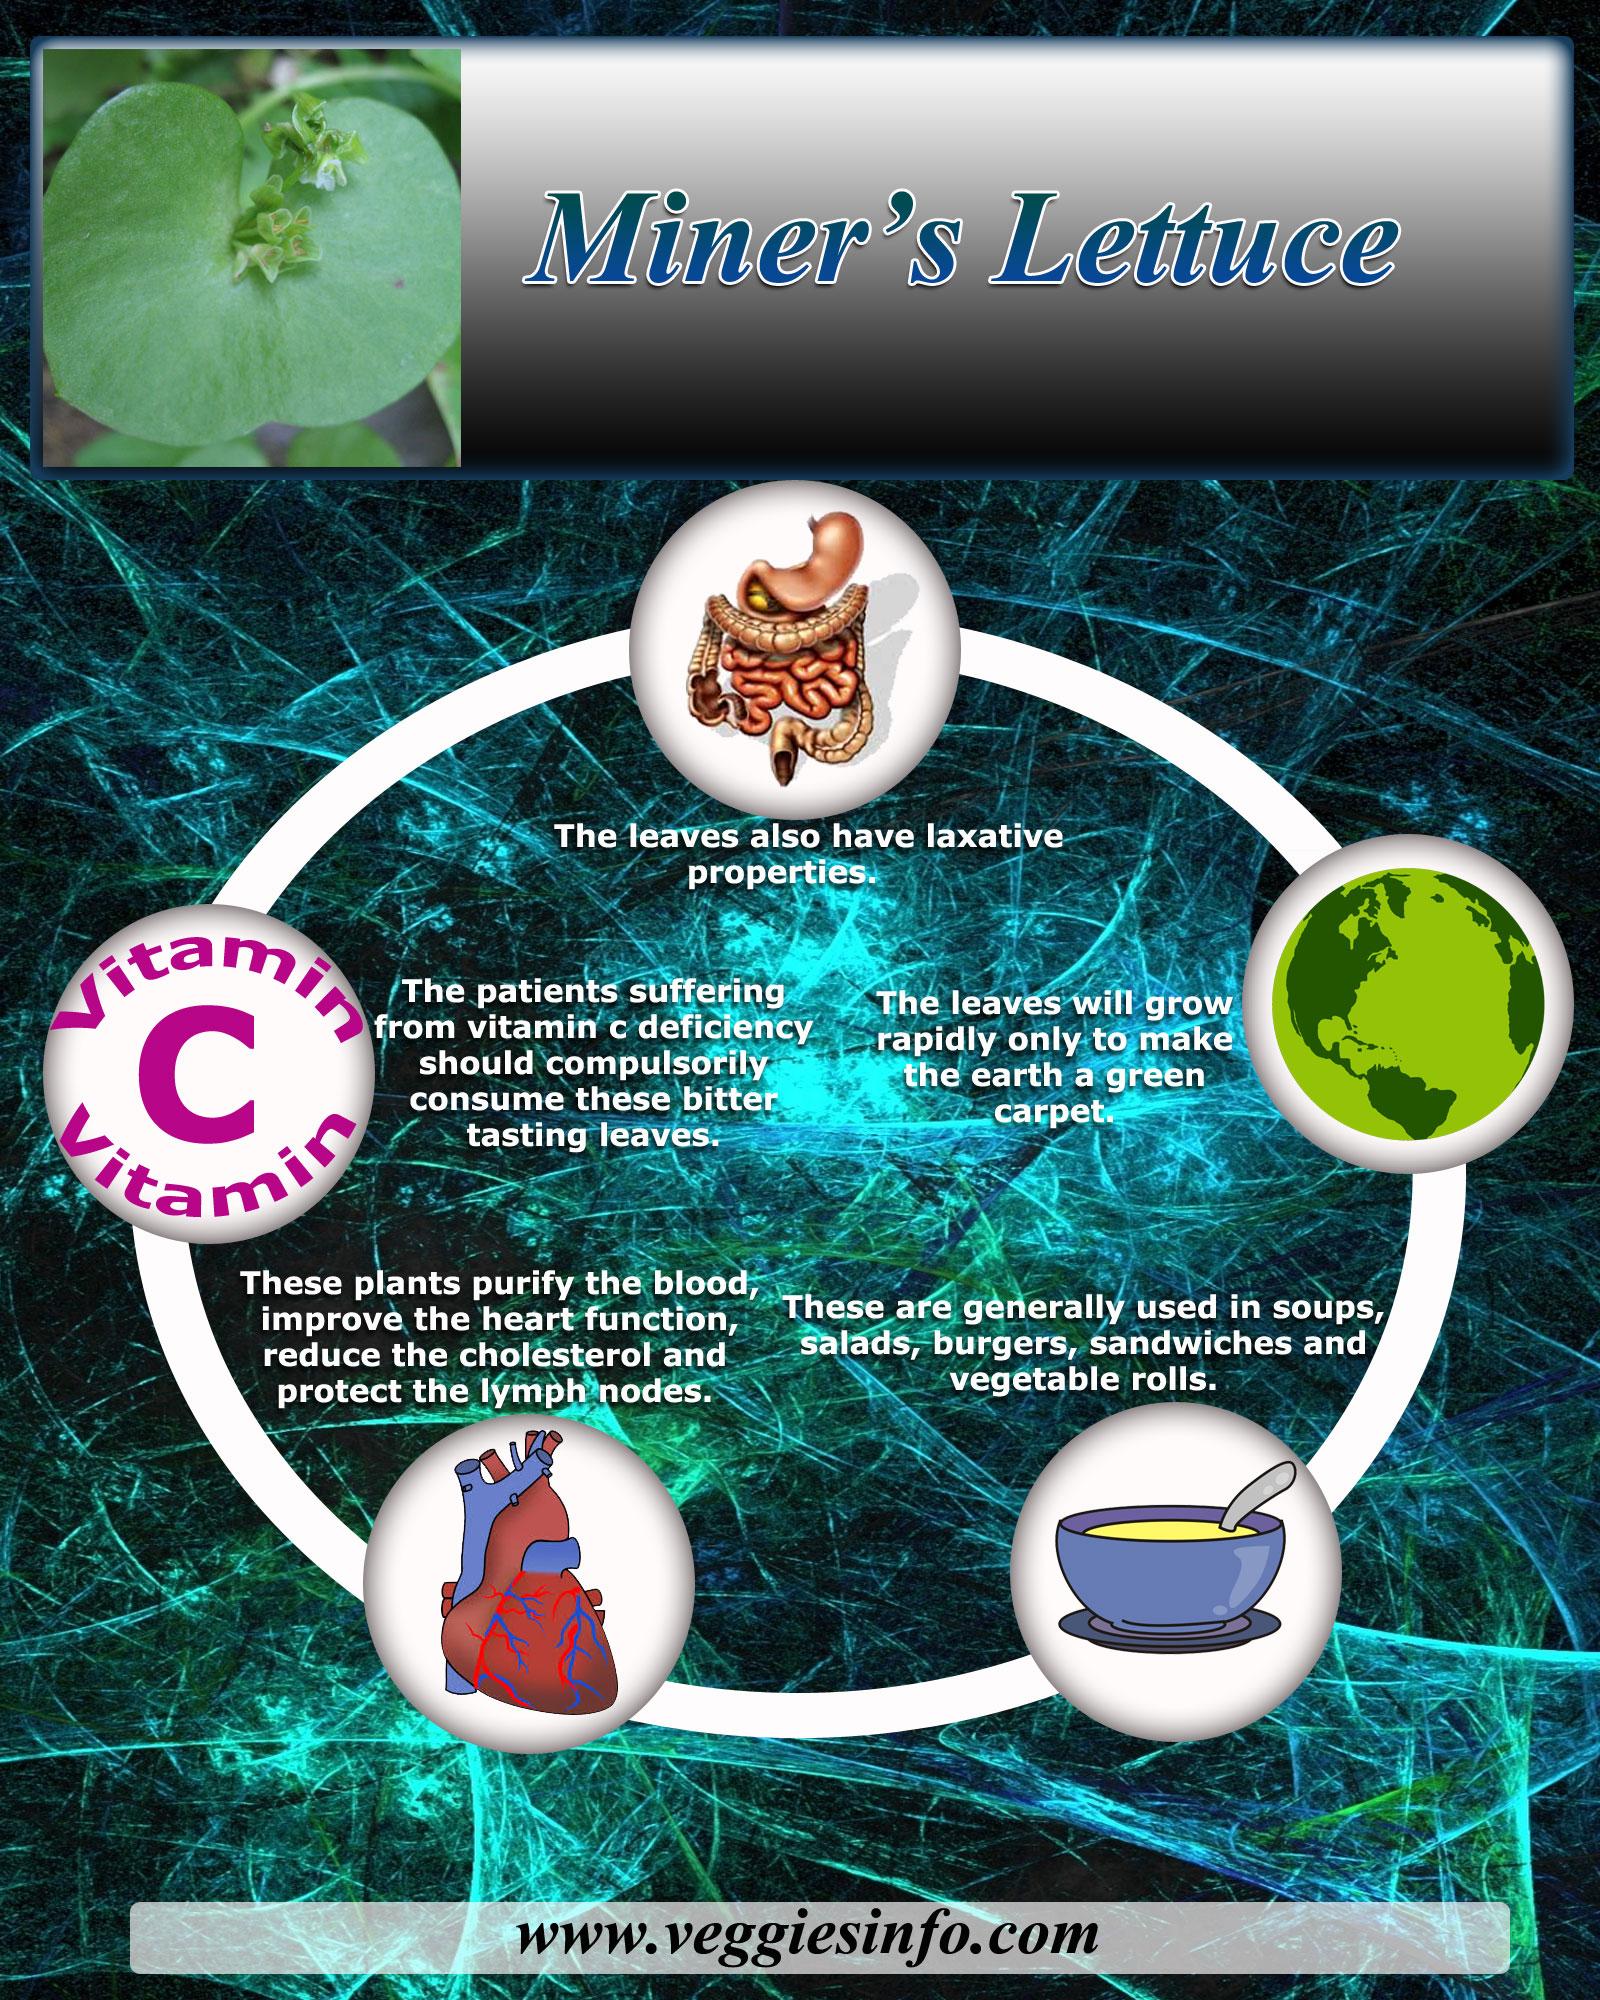 Nutritional Values of Miner's Lettuce